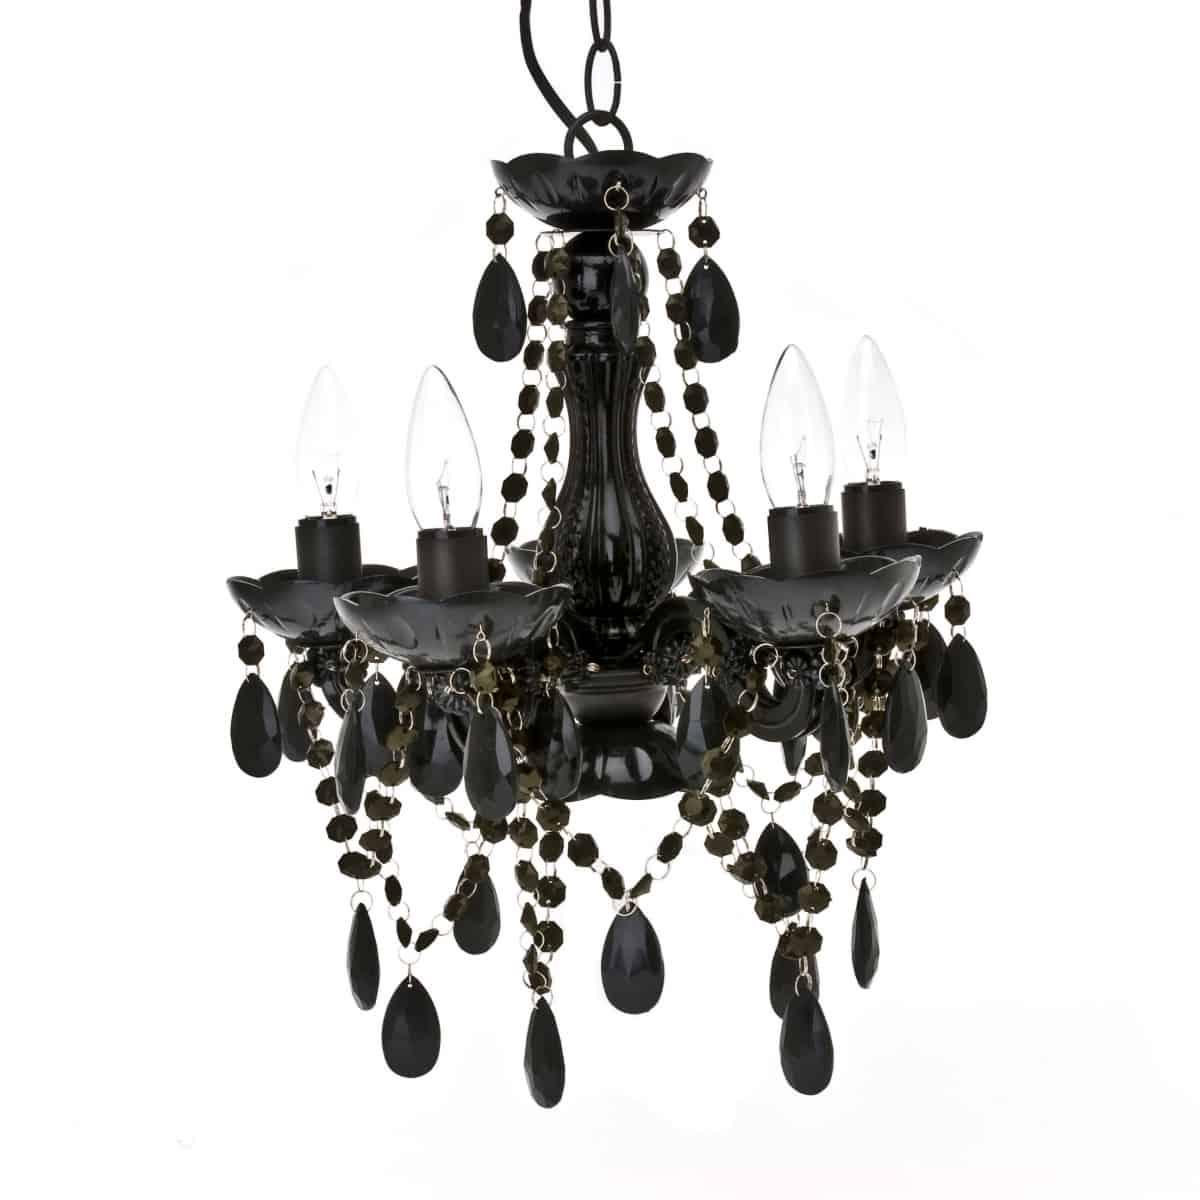 candelabru negru gypsy cu 5 brate si 5 becuri cu elemnte de decor negre pe fundal alb